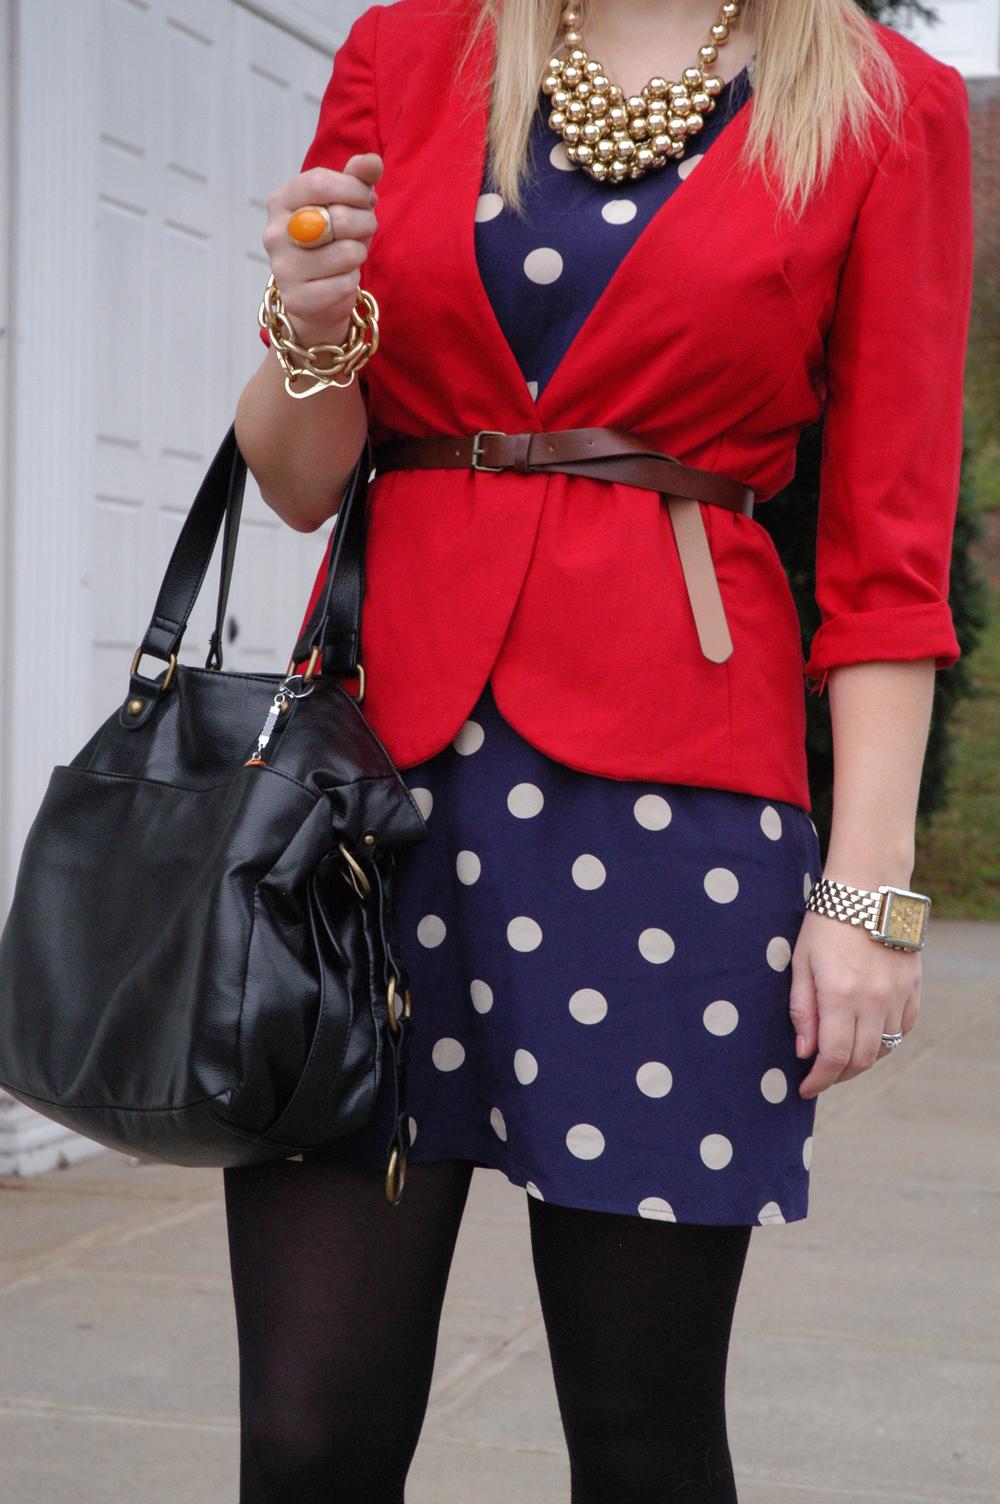 Dress: Madewell | Blazer: Handmade (Cynthia Rowley Simplicity Pattern #2250) | Tights: Merona, Target | Shoes: Dolce Vita via TjMaxx | Purse: Target | Jewelry: Joann Fabrics, H&M, Belk | Belt: H&M | Shades: H&M